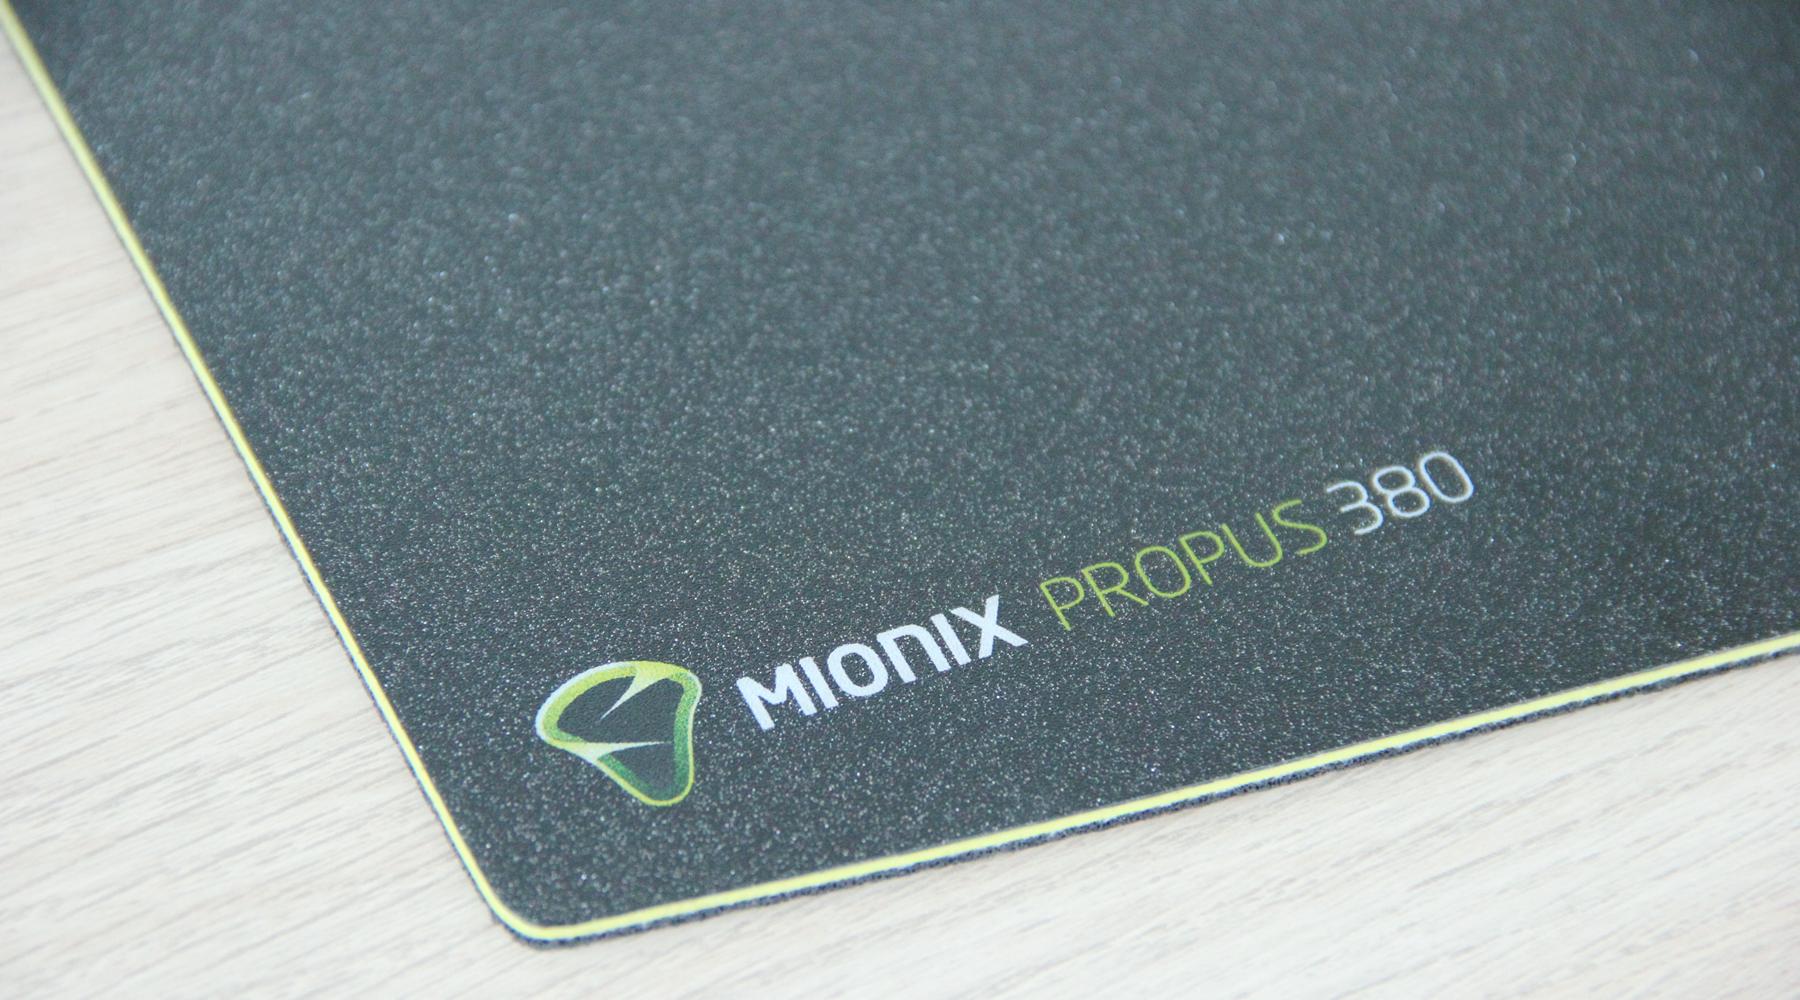 Mionix Propus Mousepad